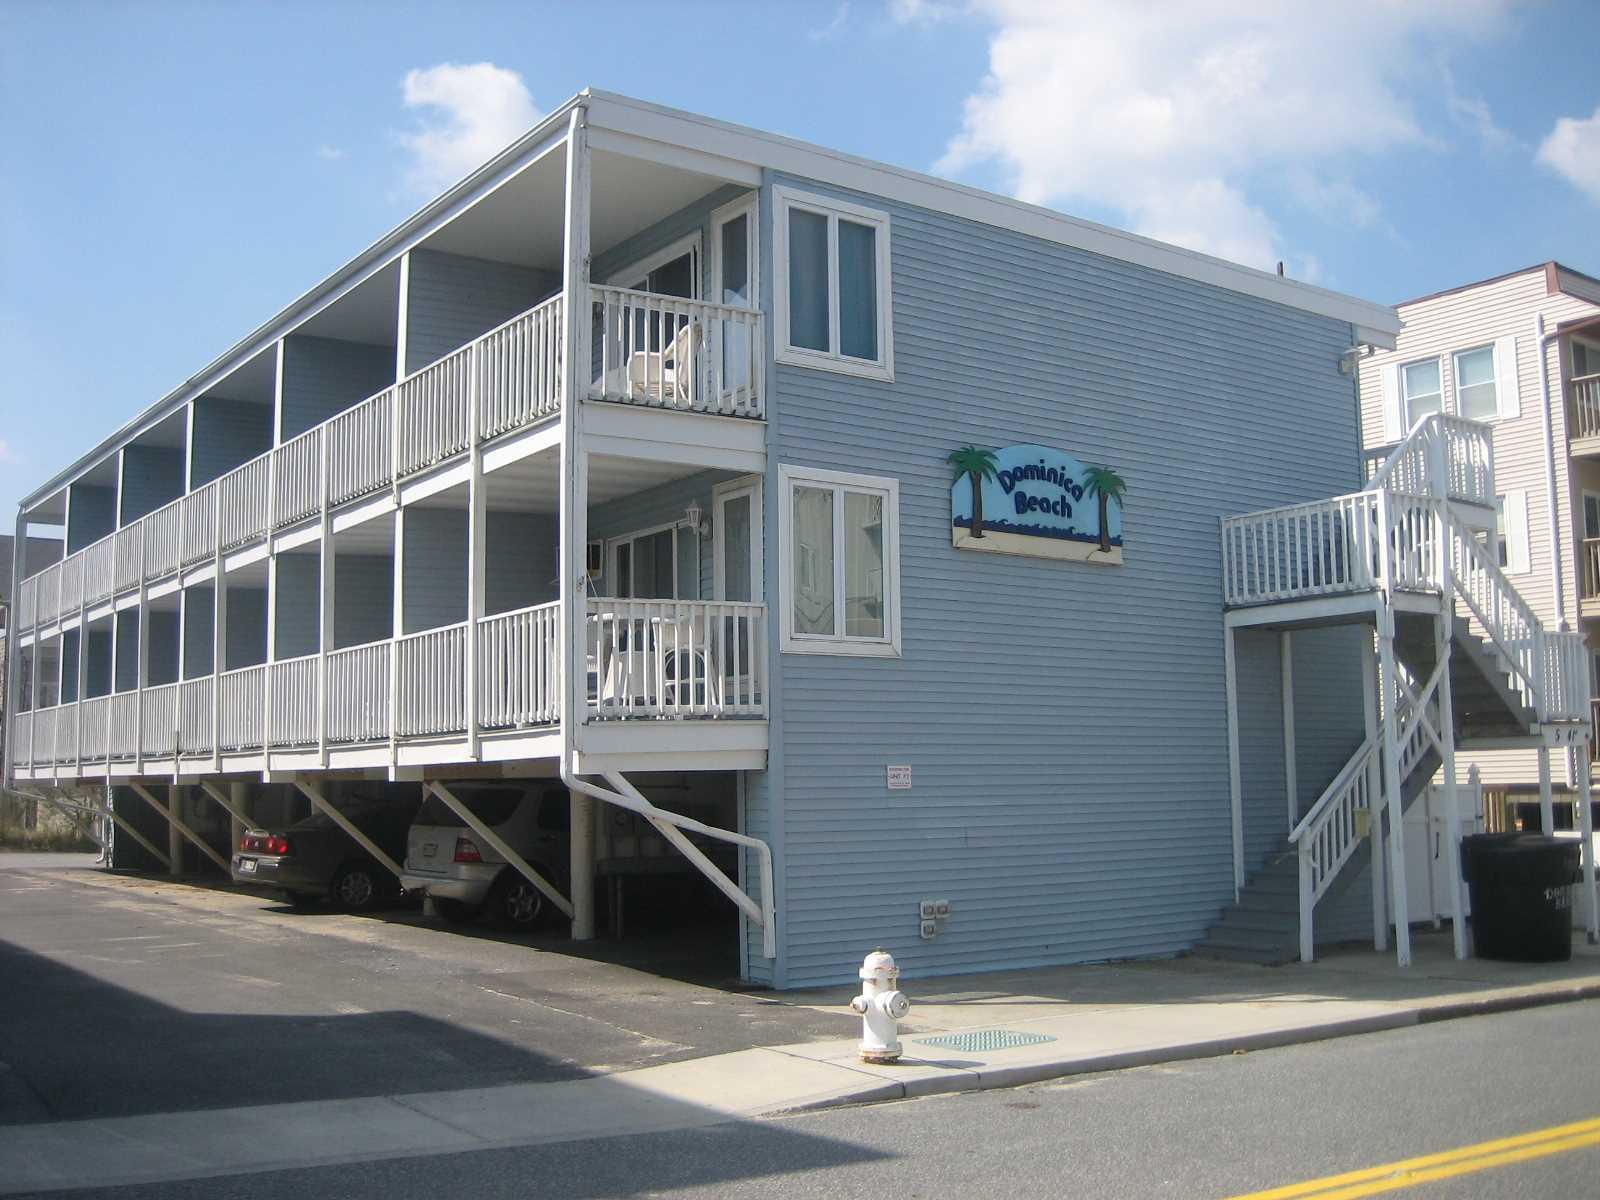 Dominic Beach Building